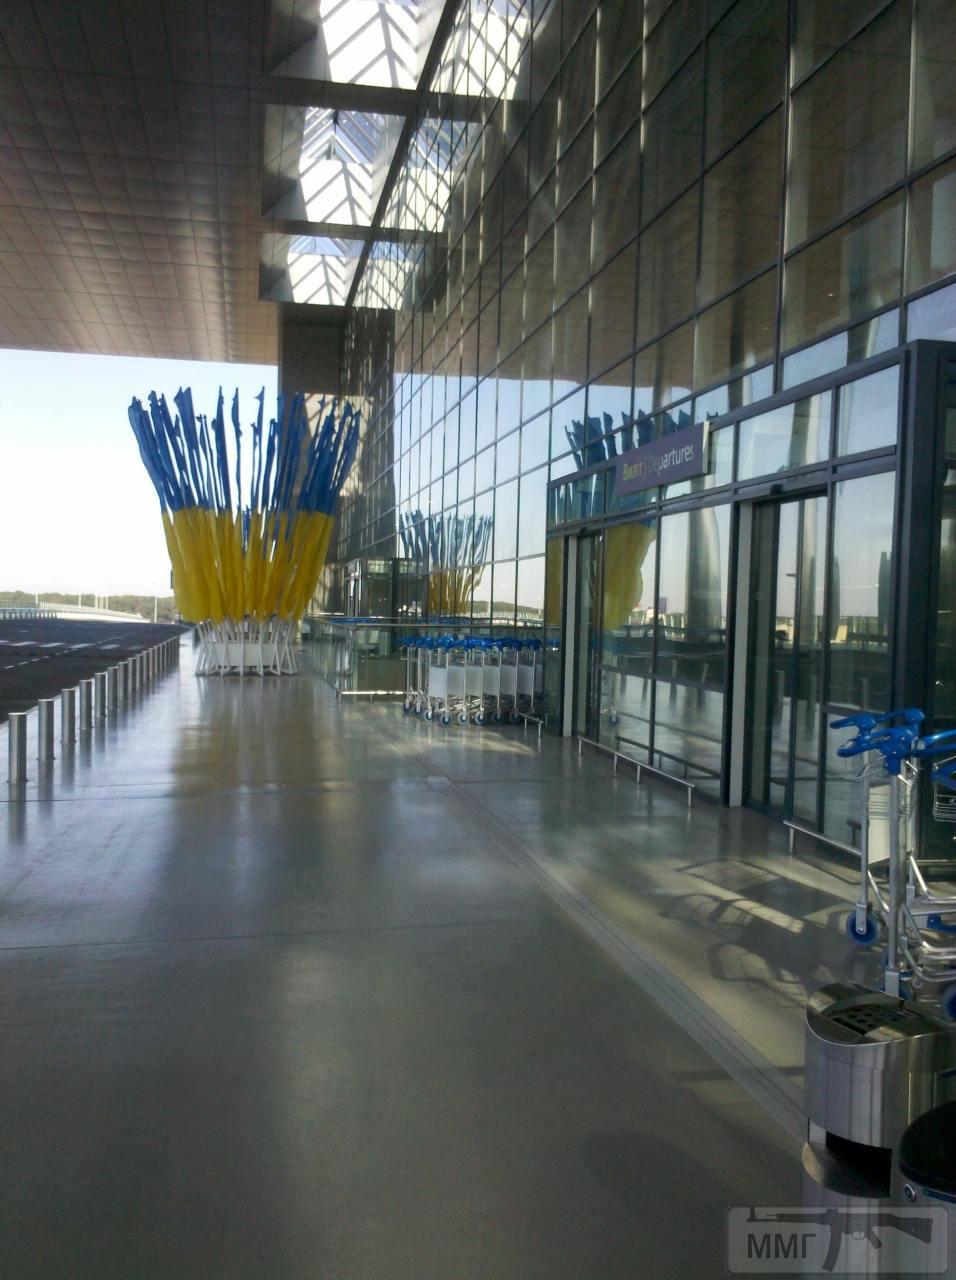 34317 - Донецкий аэропорт, новый терминал